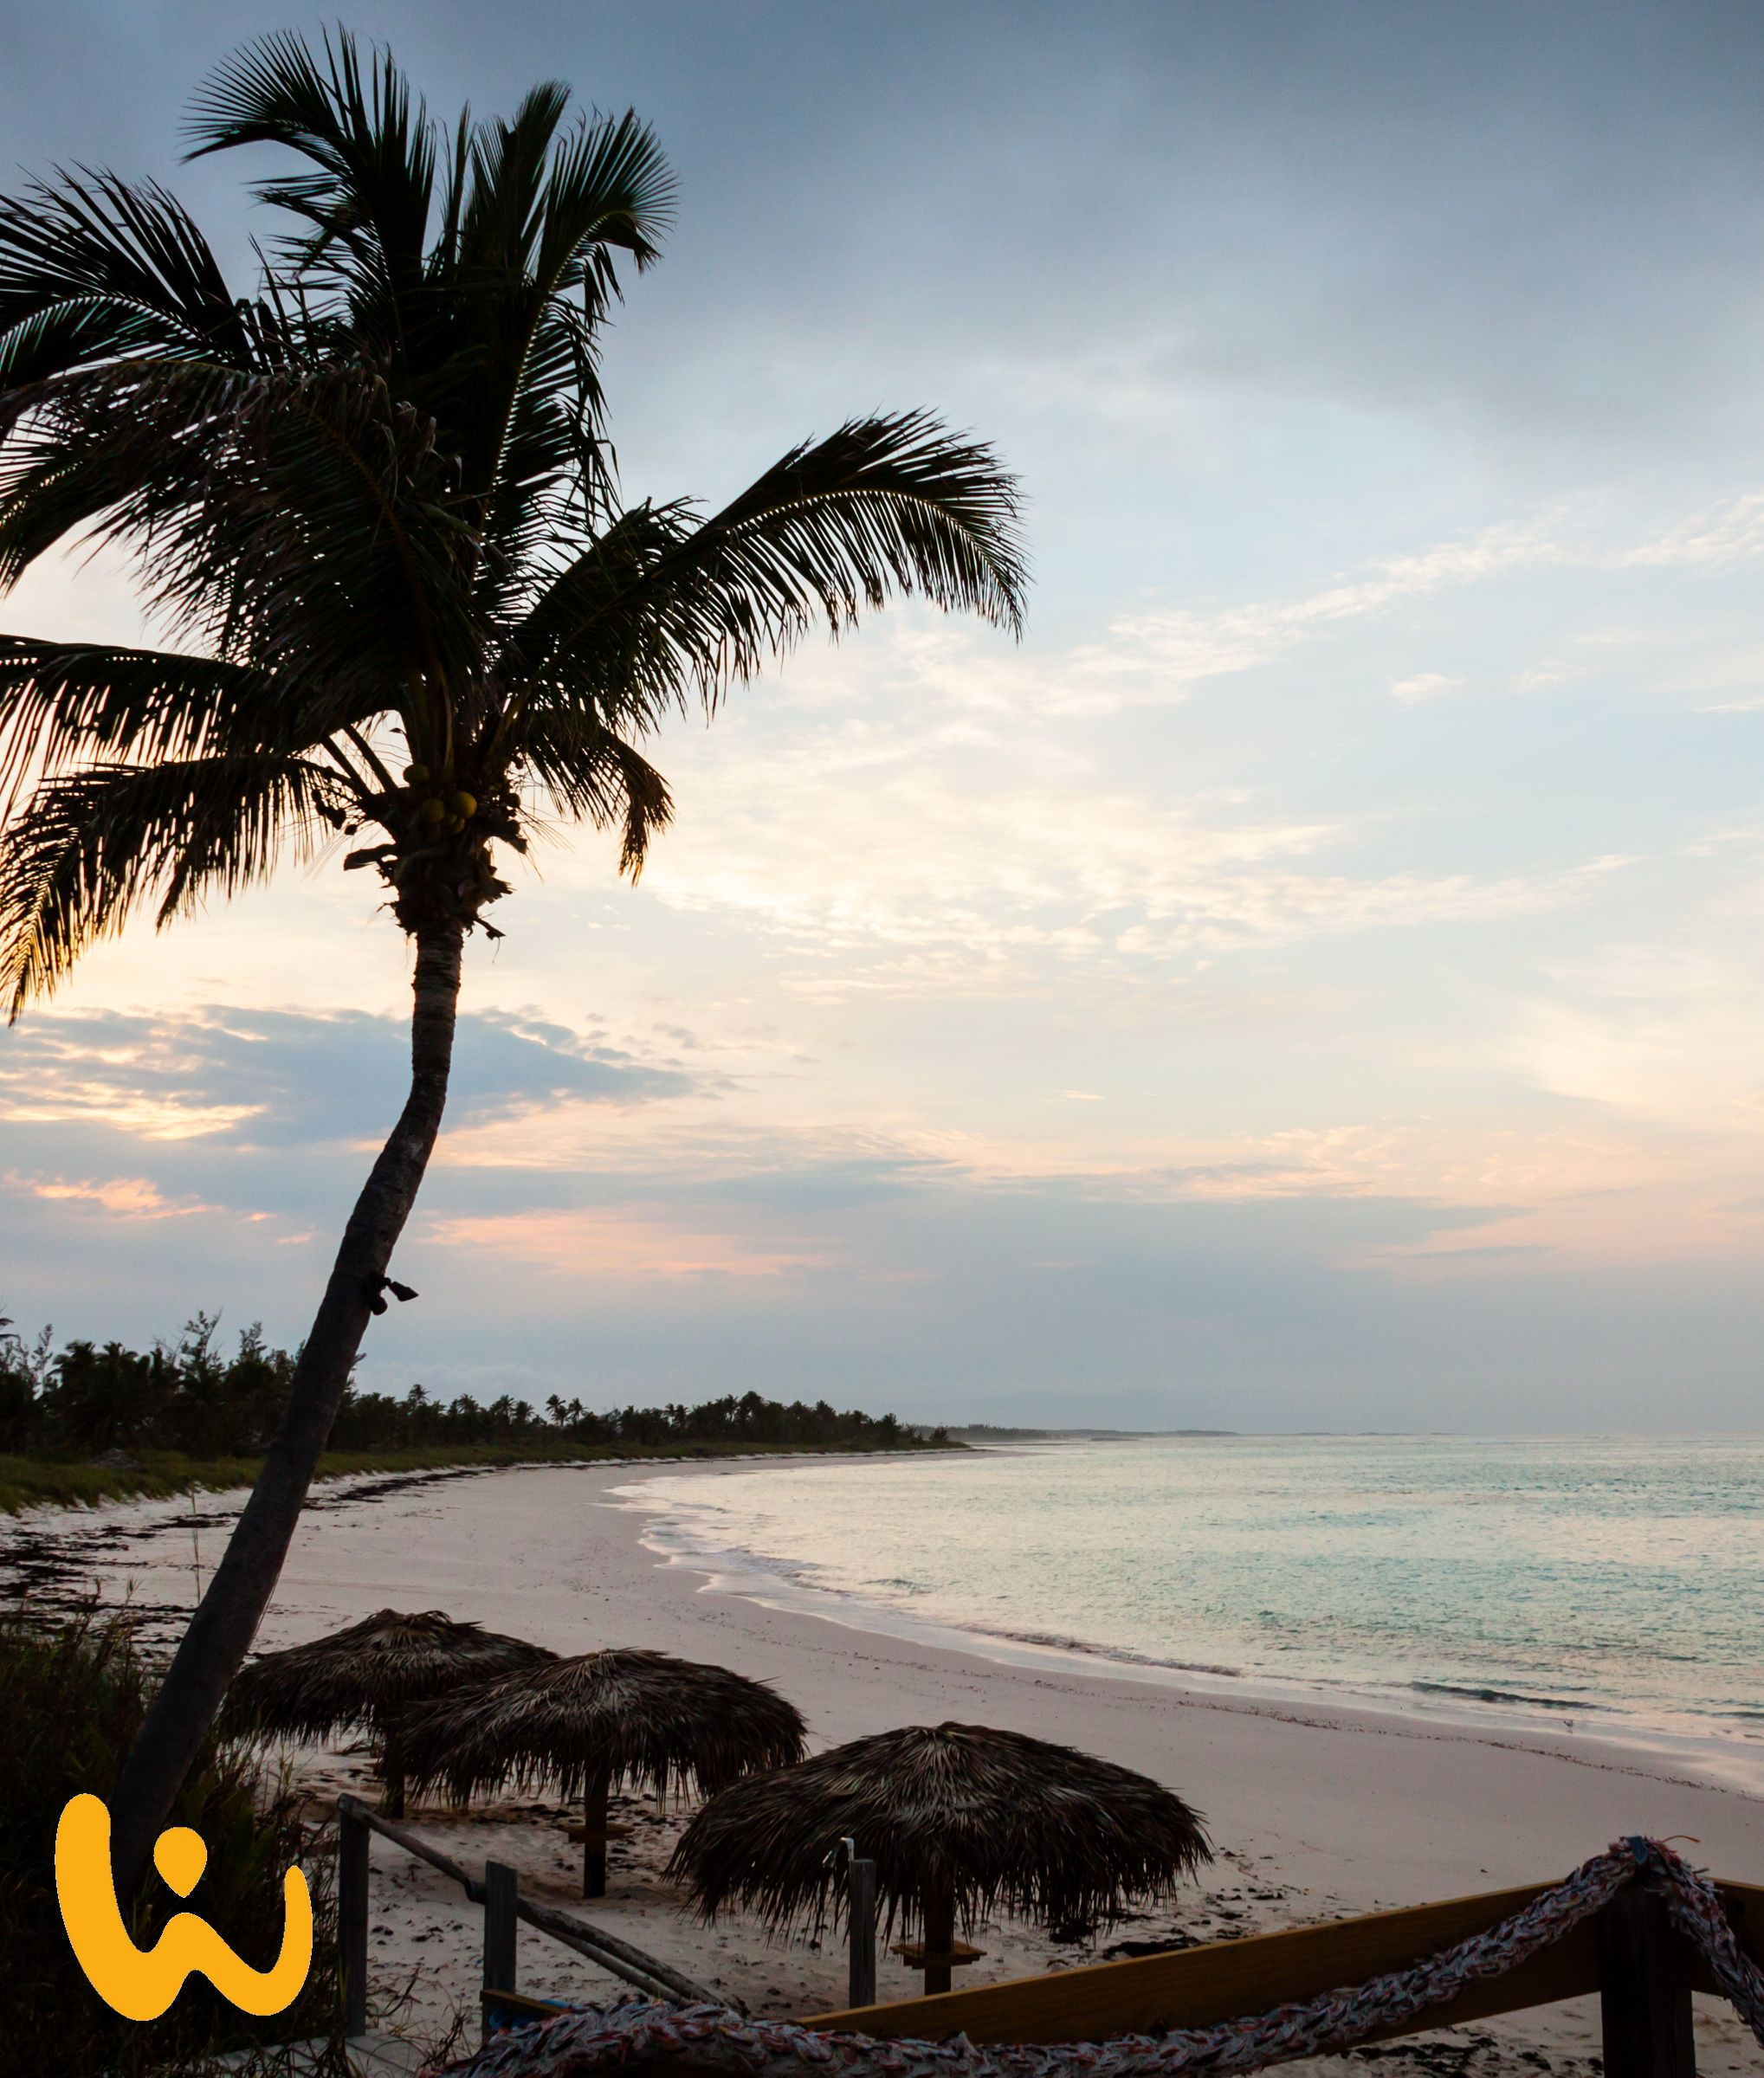 sonnenuntergang bahamas palme blaues meer sandstrand strohdach das perfekte bild was die. Black Bedroom Furniture Sets. Home Design Ideas